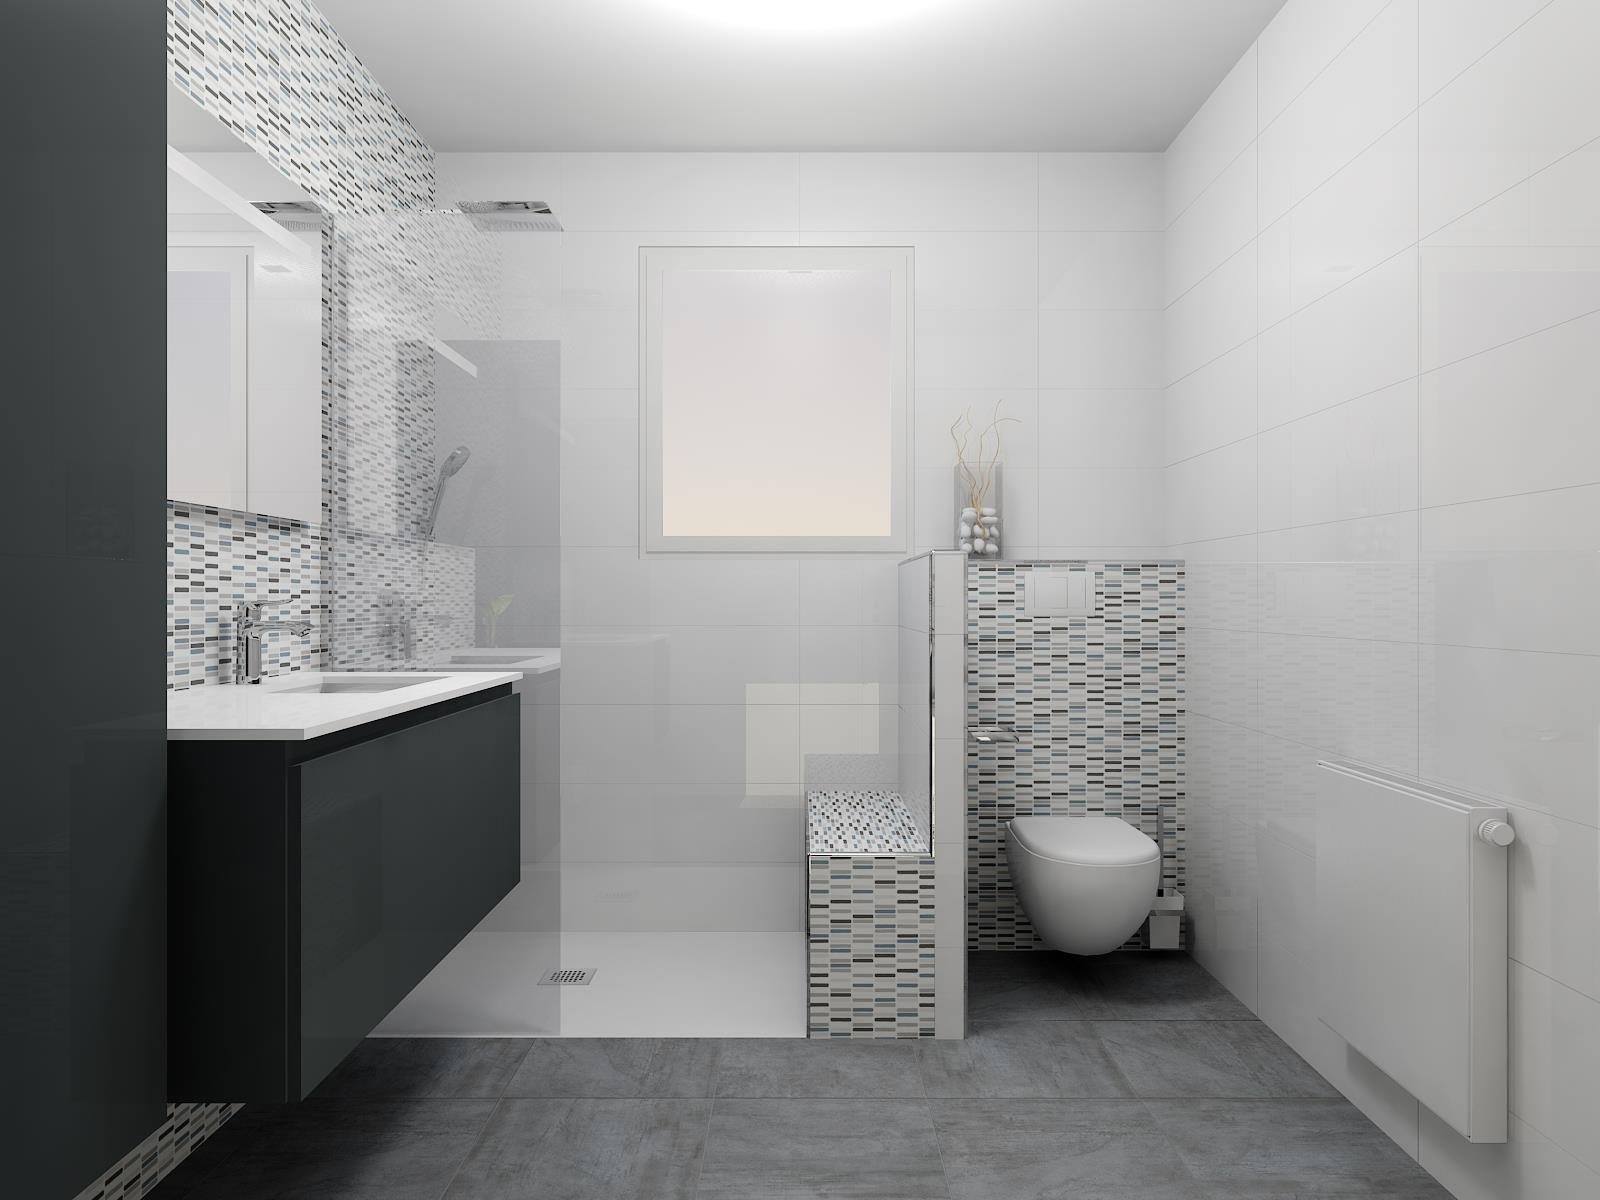 Mattout carrelage dem13247 3 bathroom by mattout carrelage for Mattout carrelage